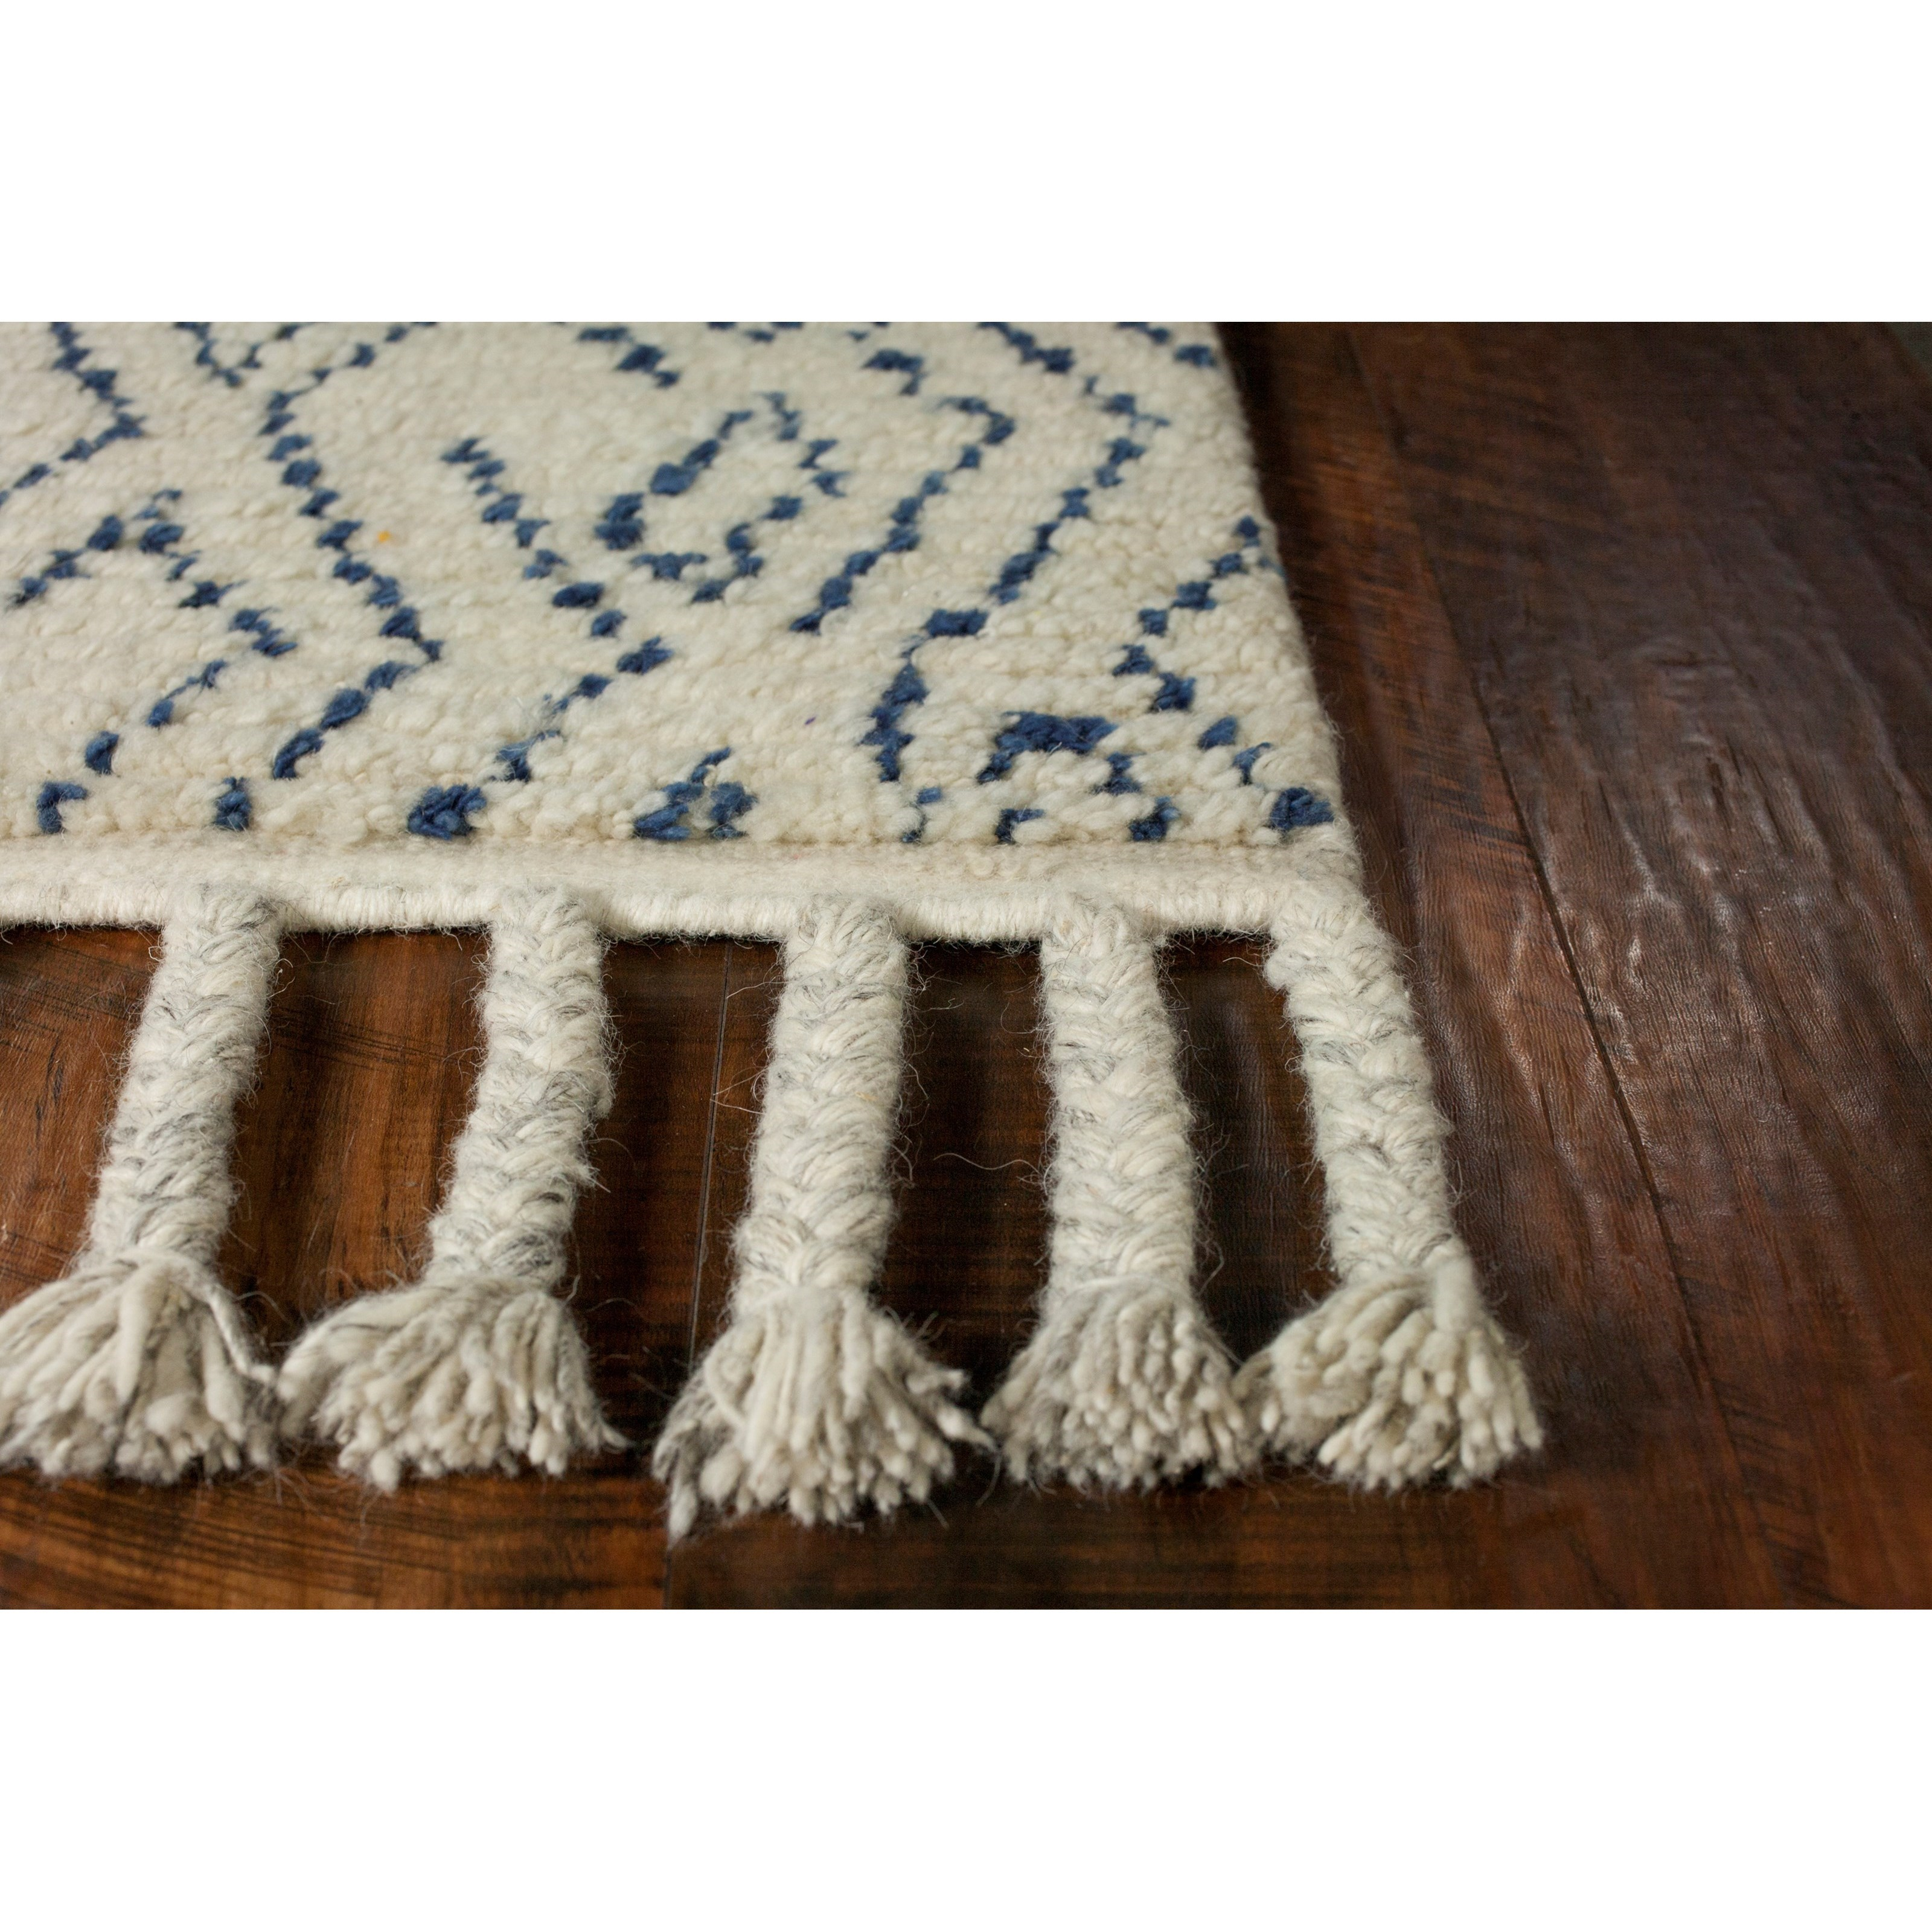 9' x 13' Ivory/Blue Mediterra Rug